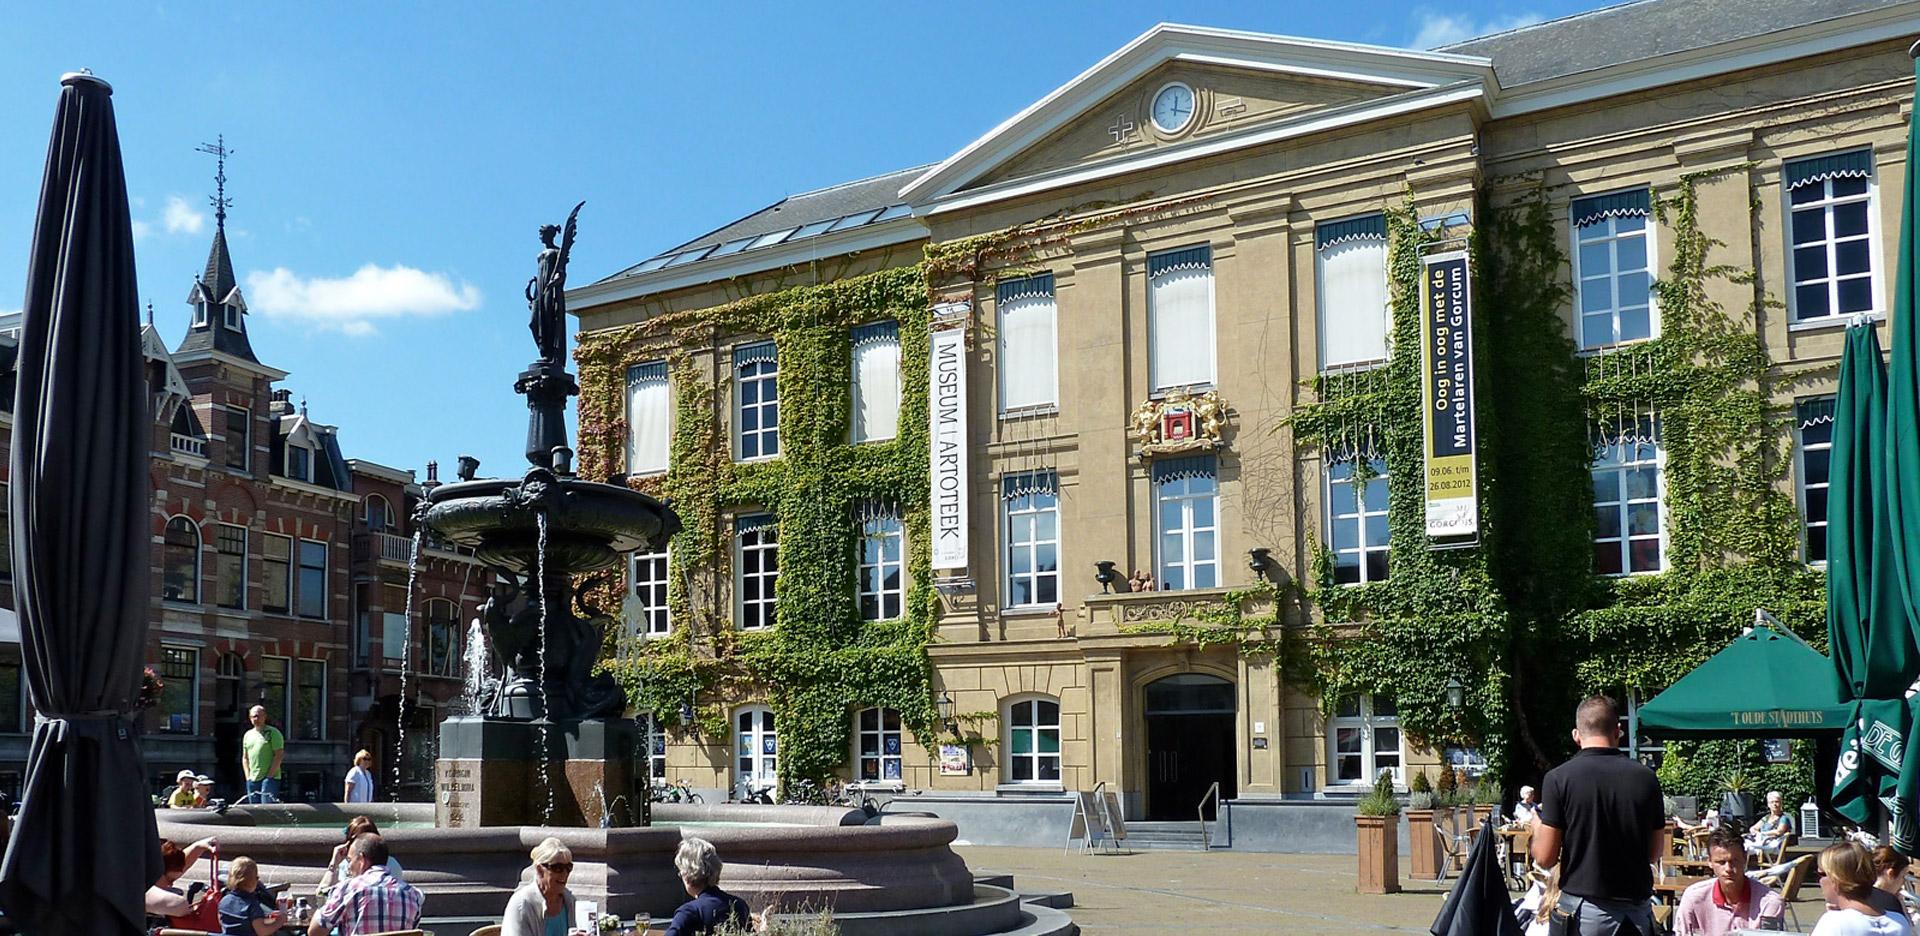 Bovenwoning te huur Gorinchem binnenstad Gasthuisstraat